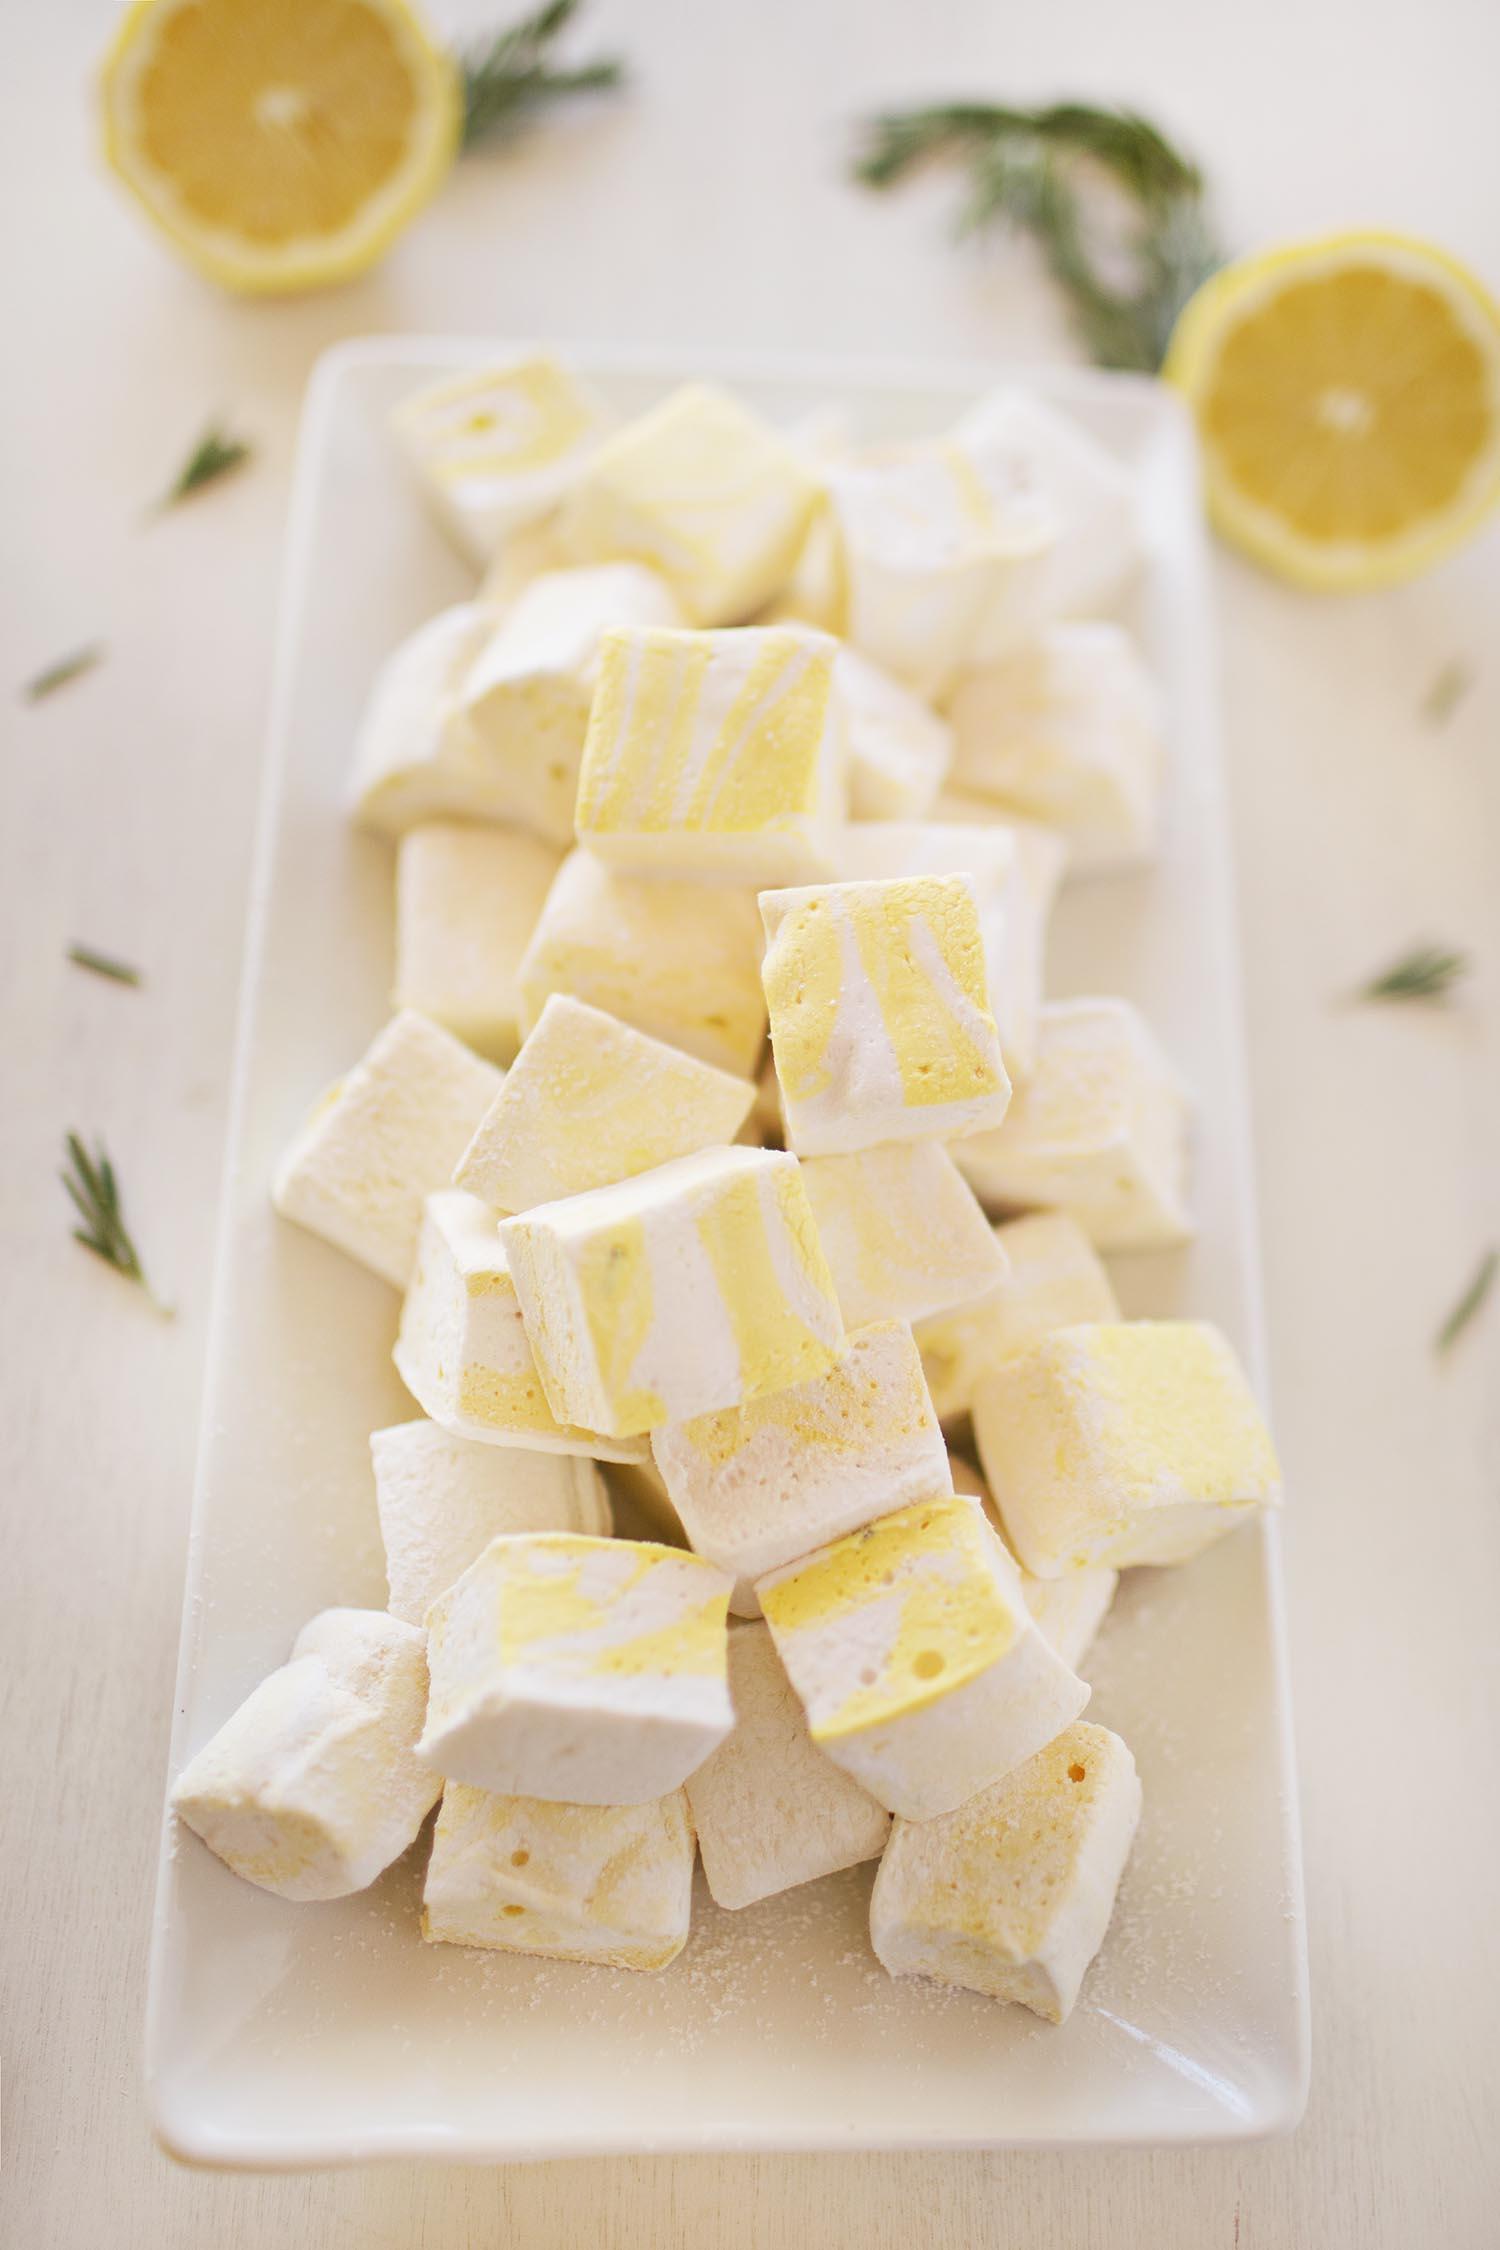 Lemon and Rosemary Marhmallows (via abeautifulmess.com)